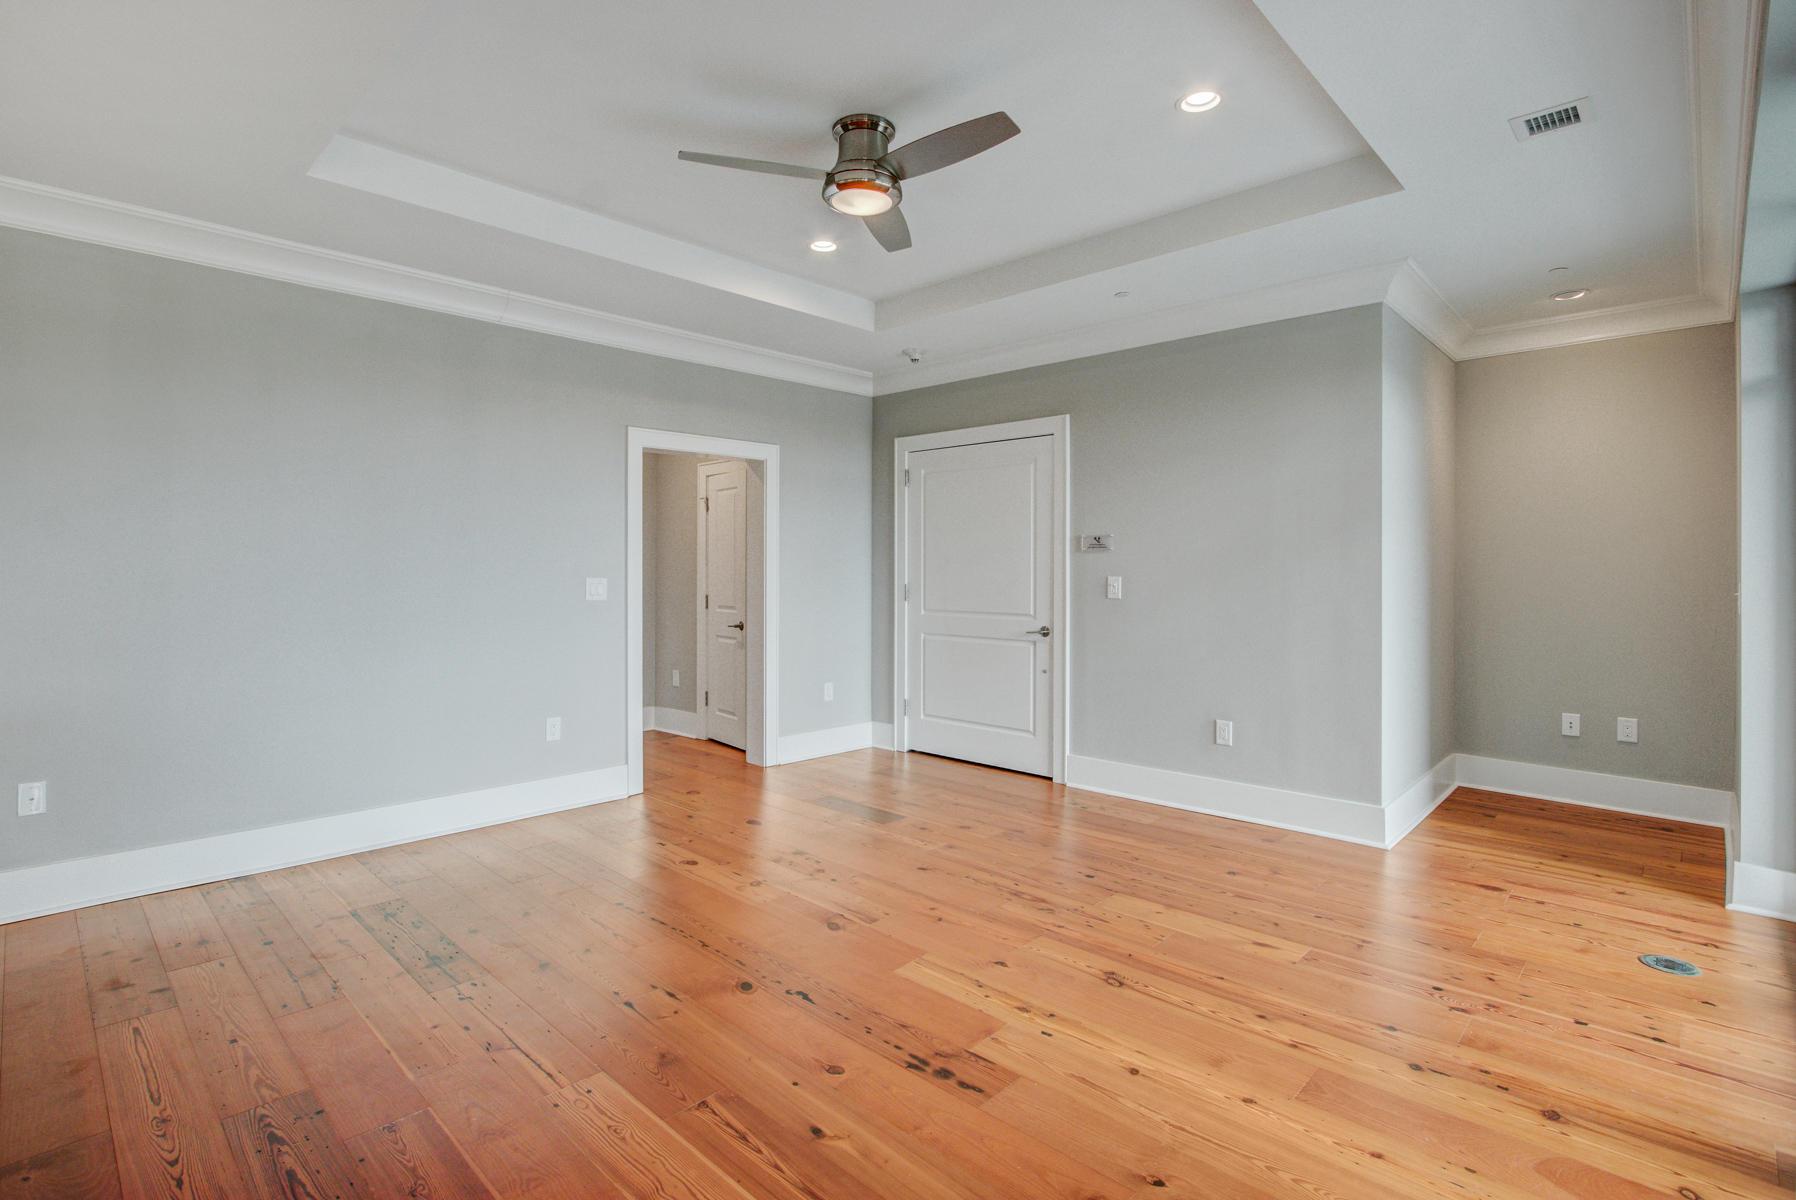 Tides IV Condominiums Homes For Sale - 155 Wingo, Mount Pleasant, SC - 31